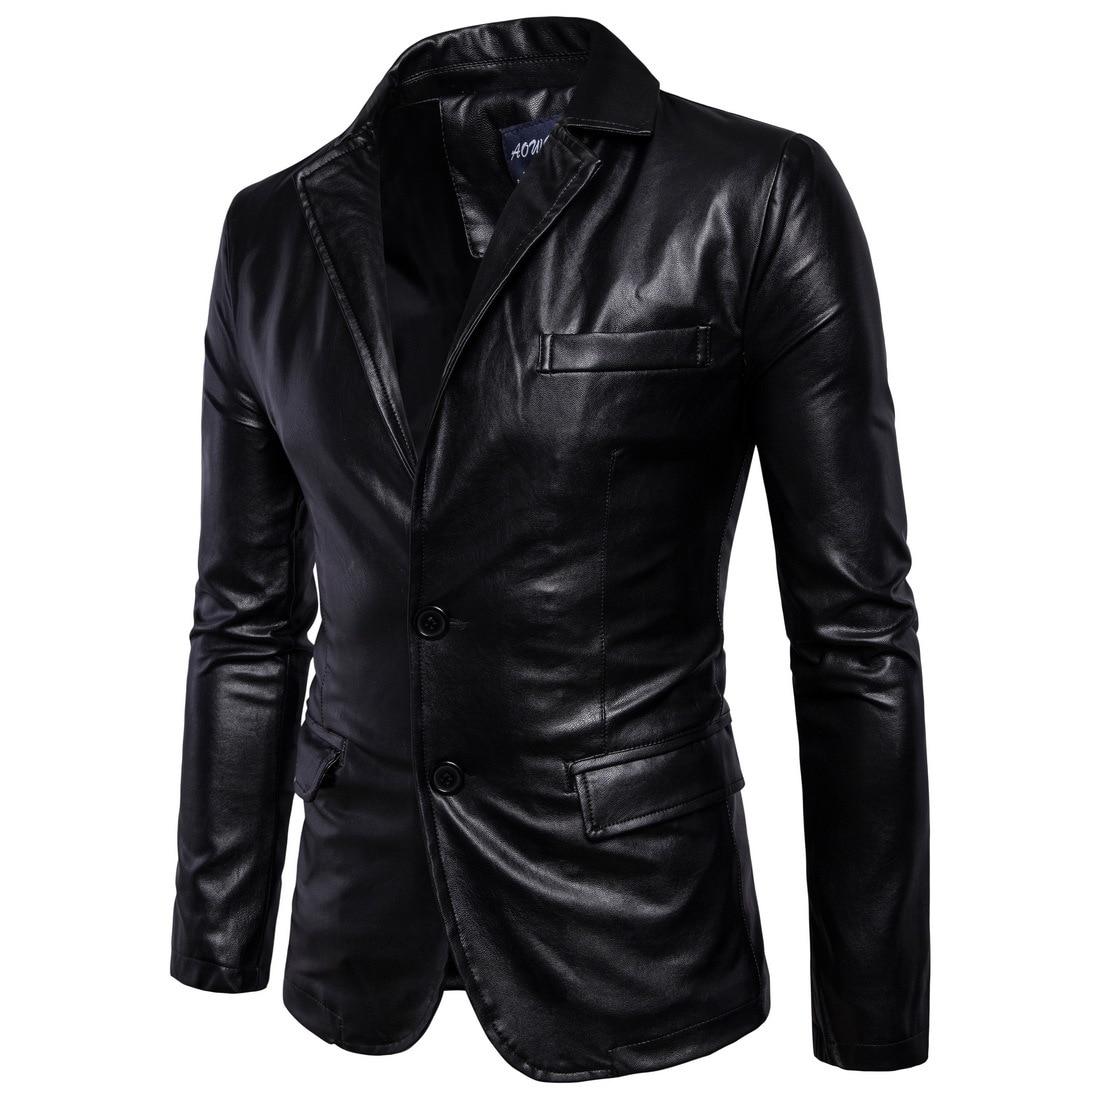 [Code] European 2019 Spring And Autumn New Style MEN'S Leather Coat England Men'S Wear Locomotive Leather Coat B011